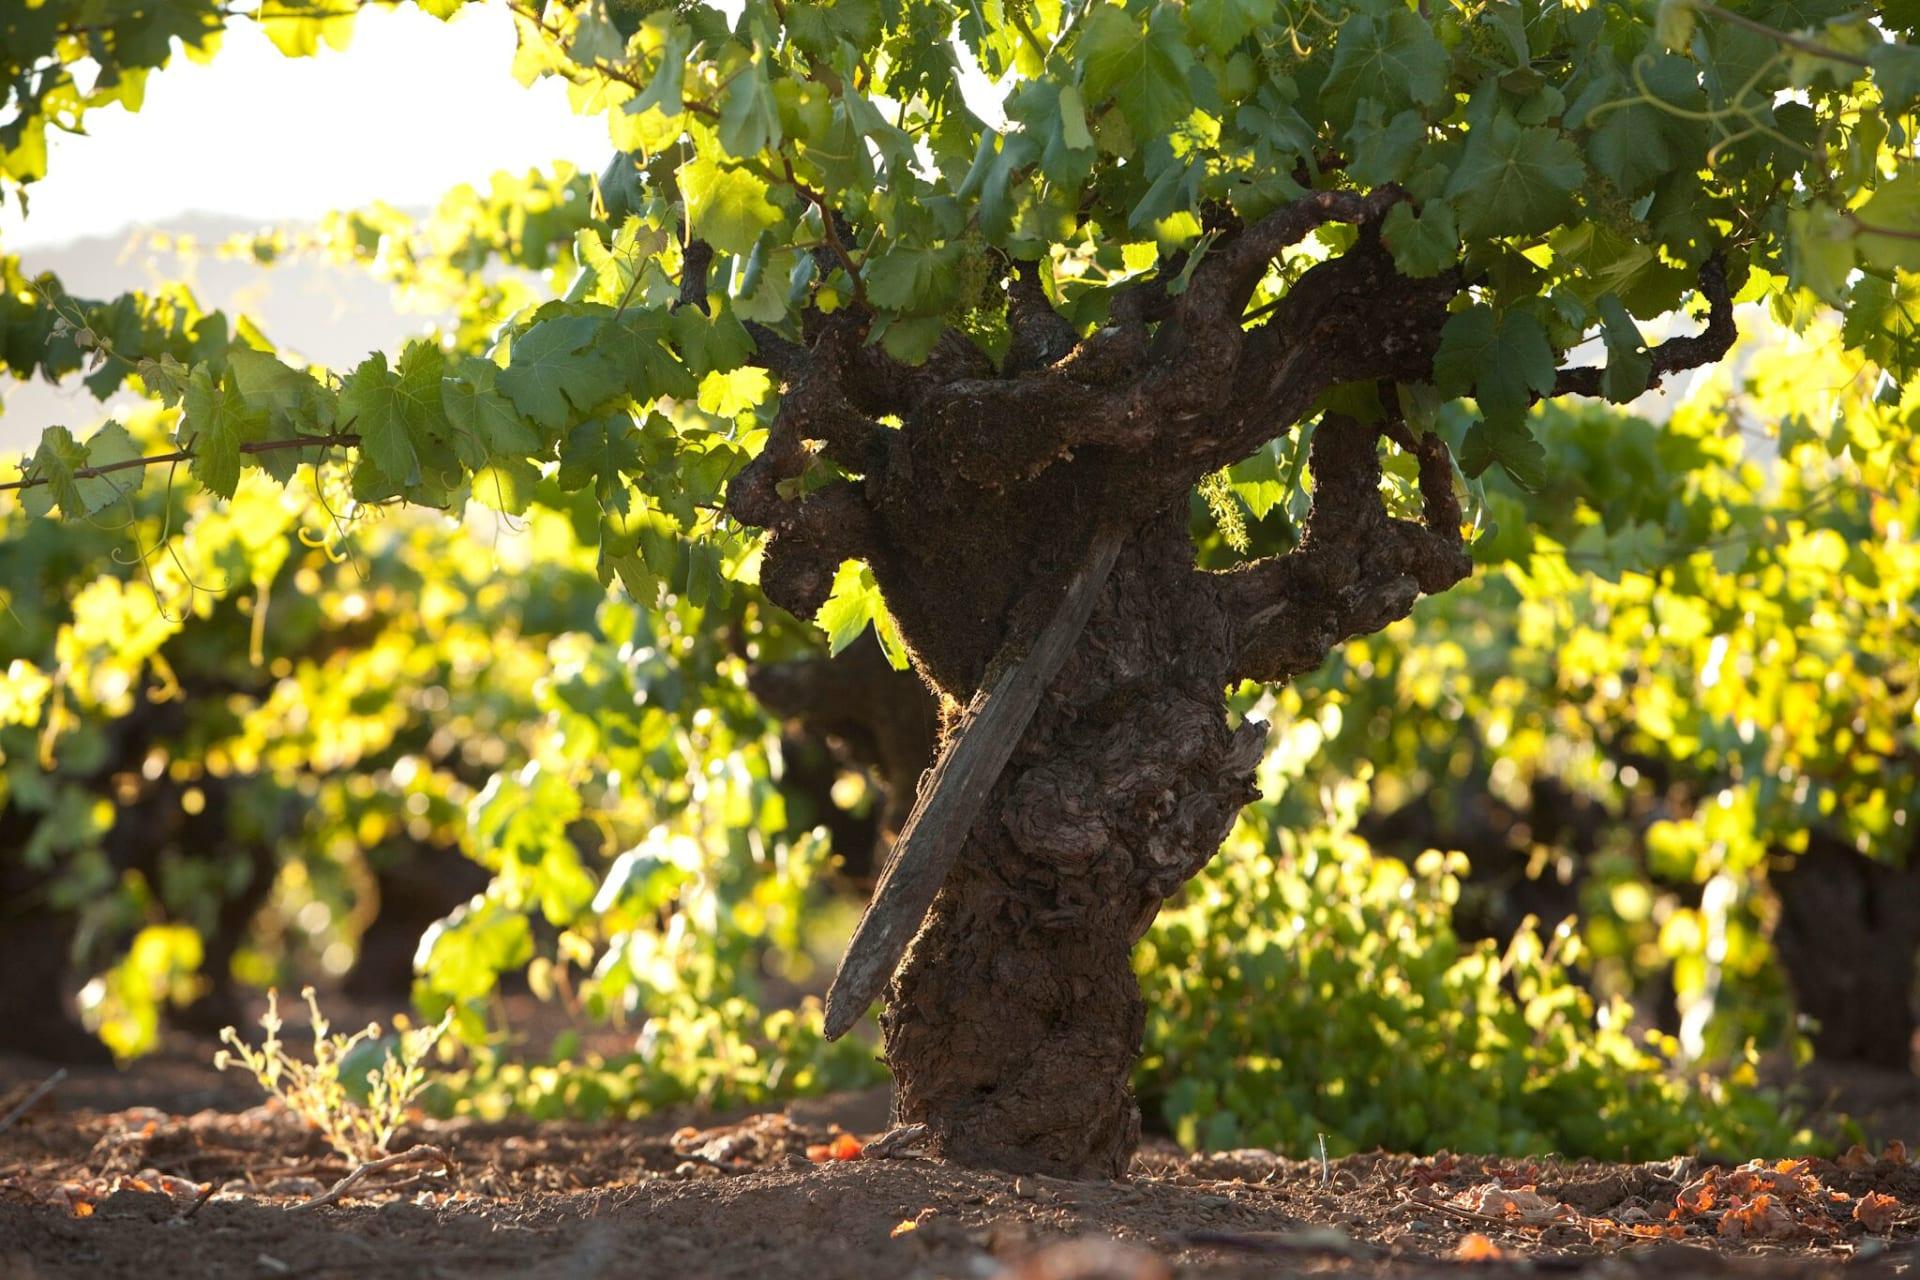 Zinfandel Fall Wine - Sonoma, California